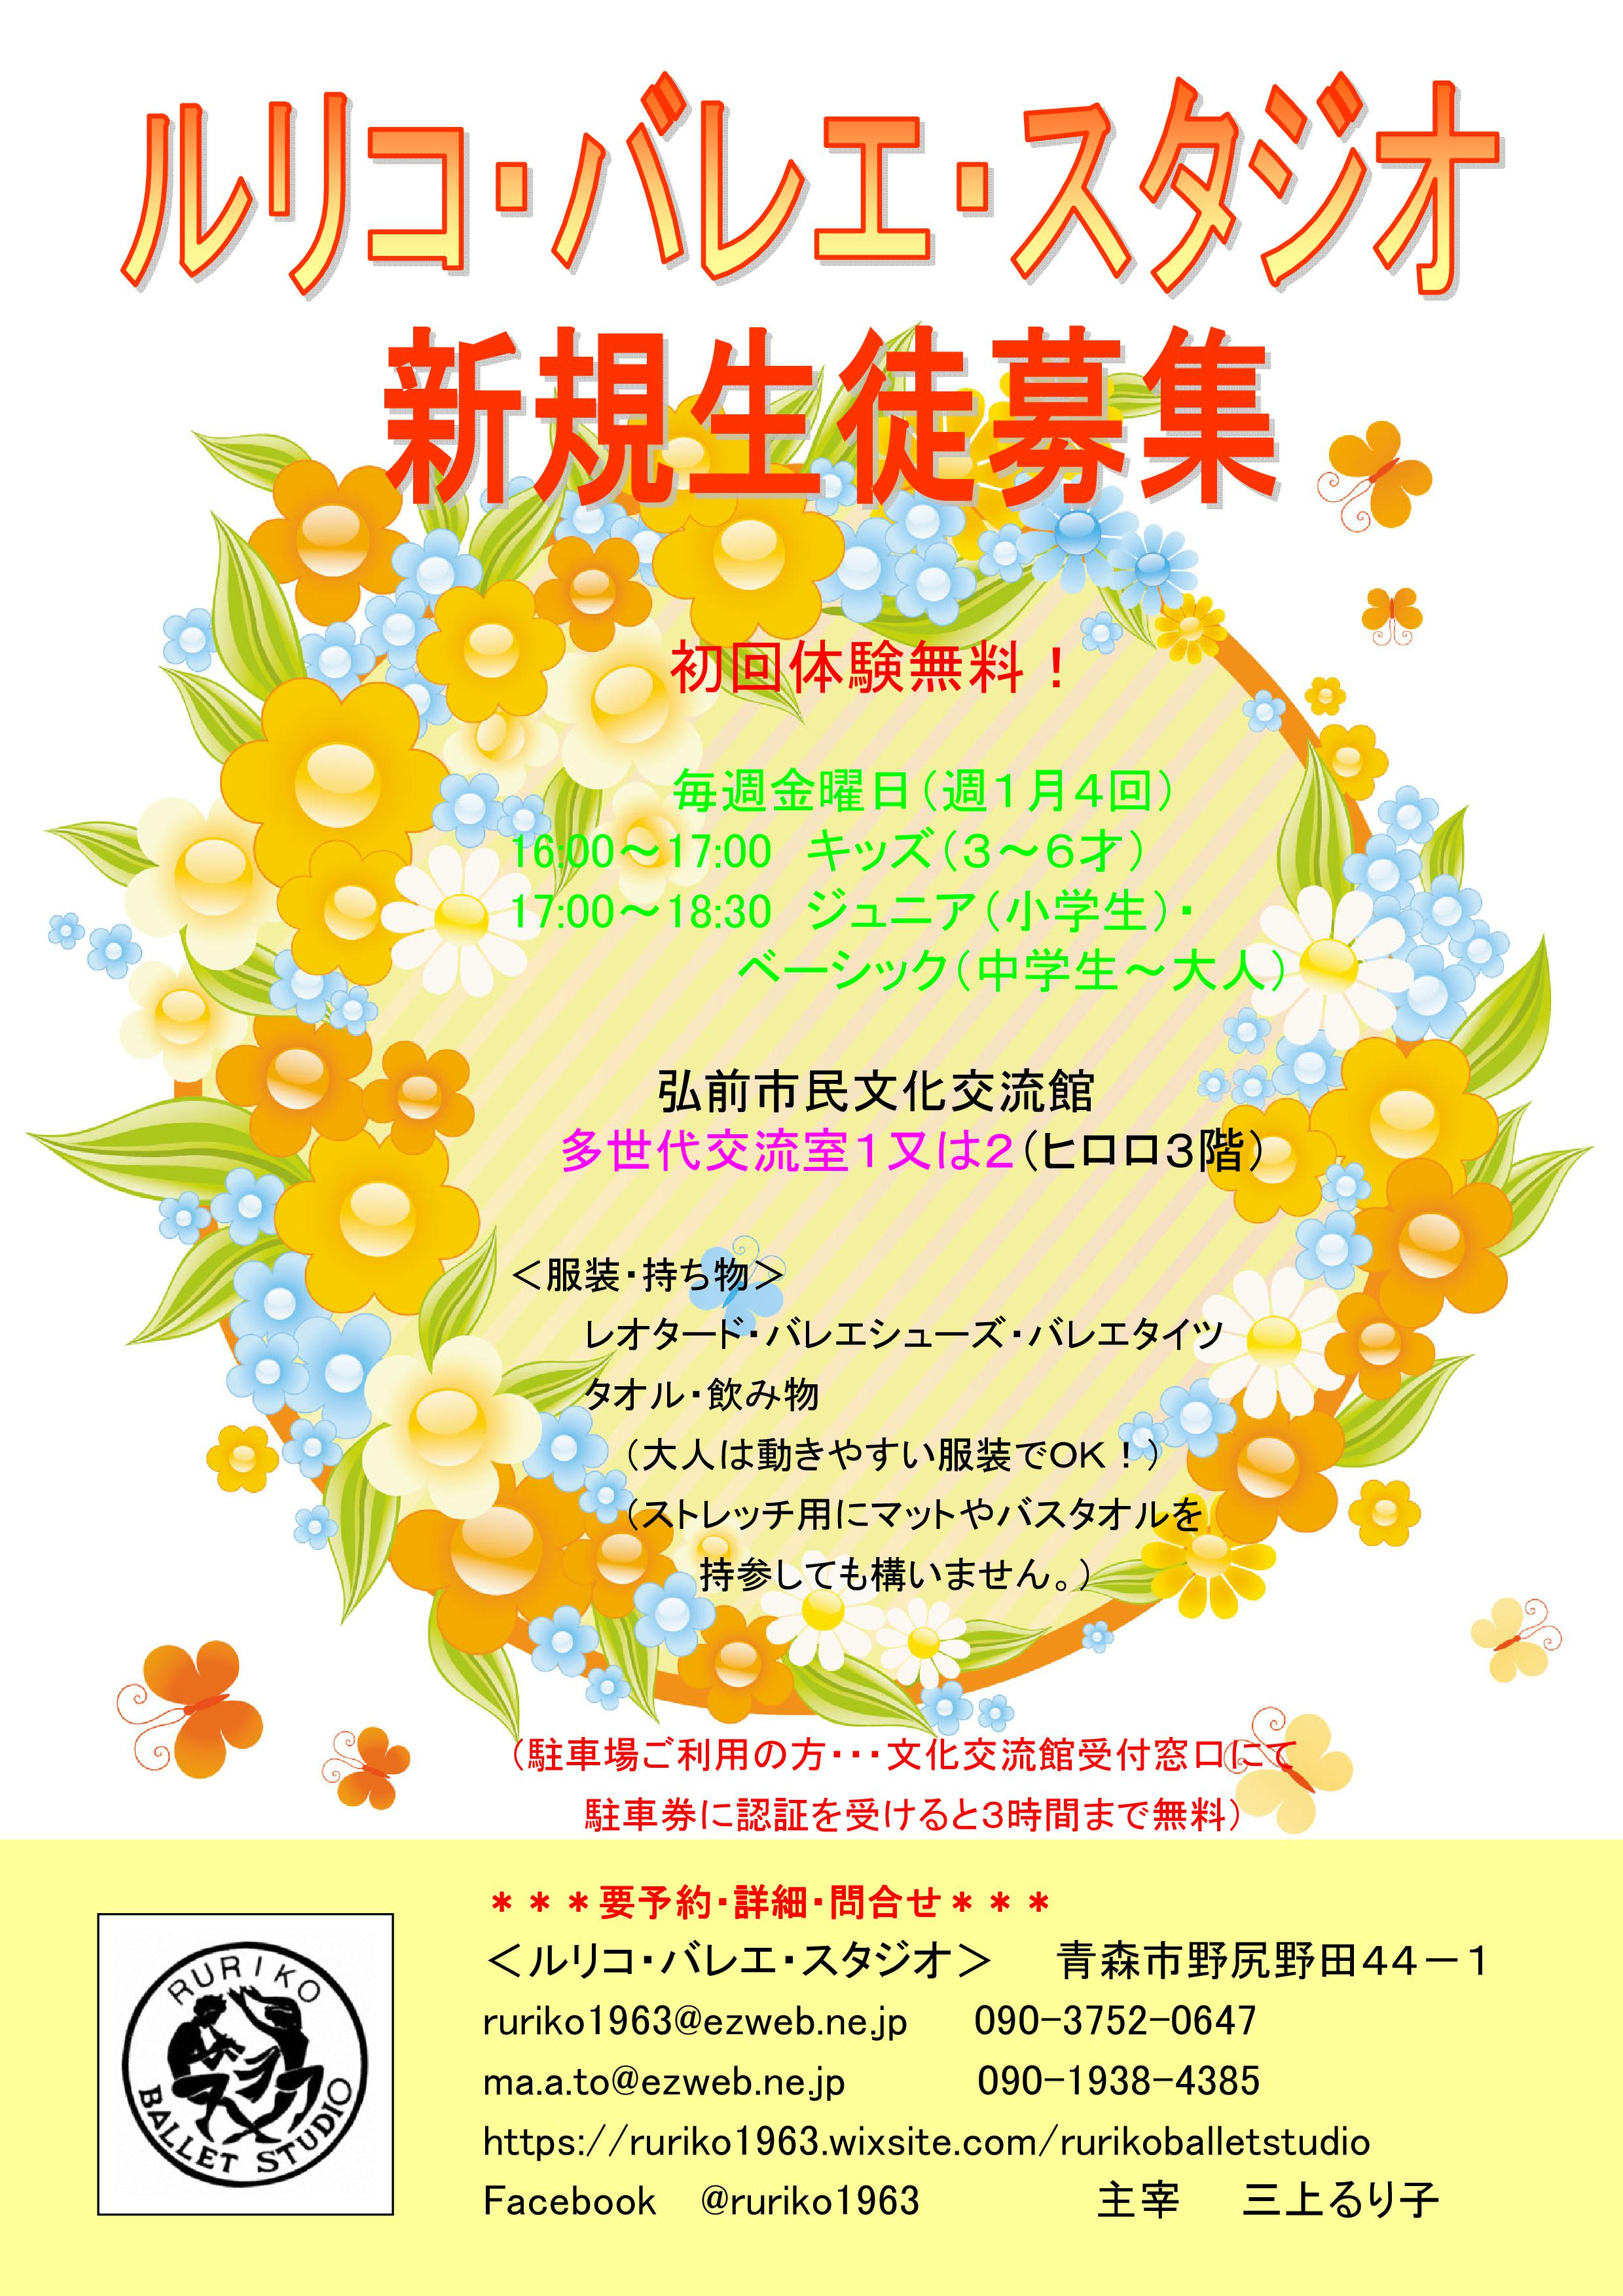 event_img_1_00014267.jpg